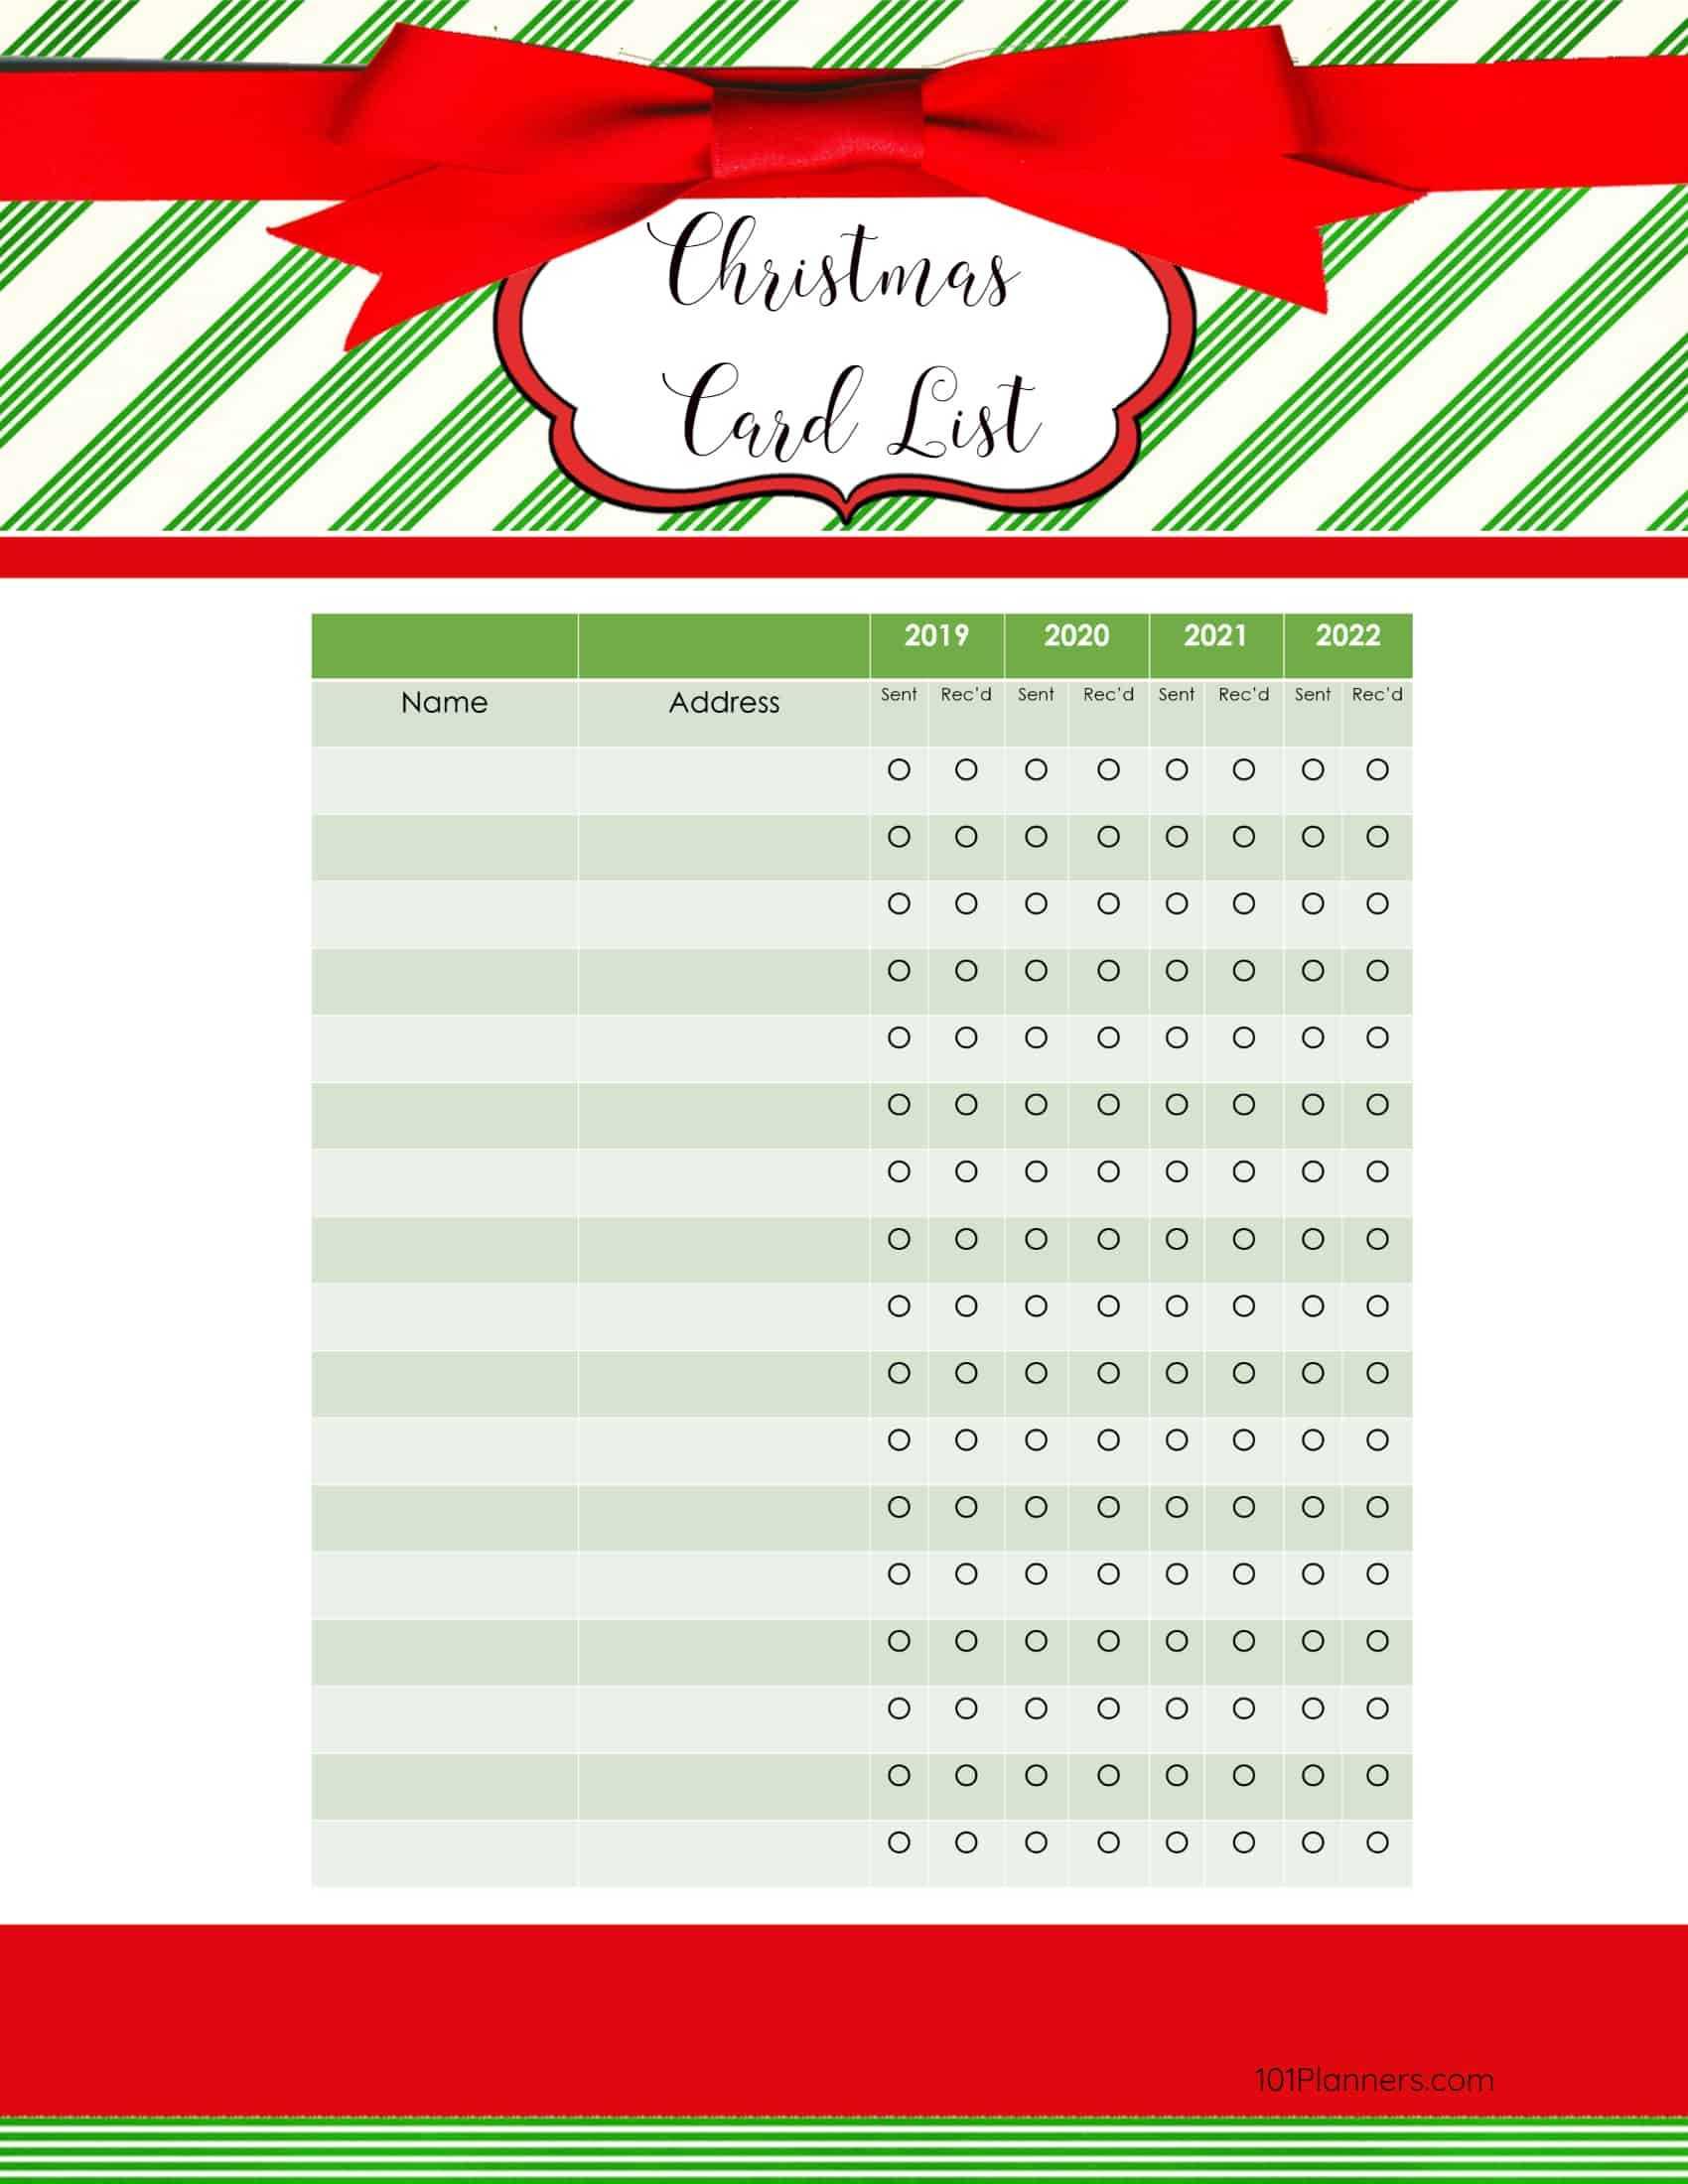 Free Printable Christmas Gift List Template In Christmas Card List Template